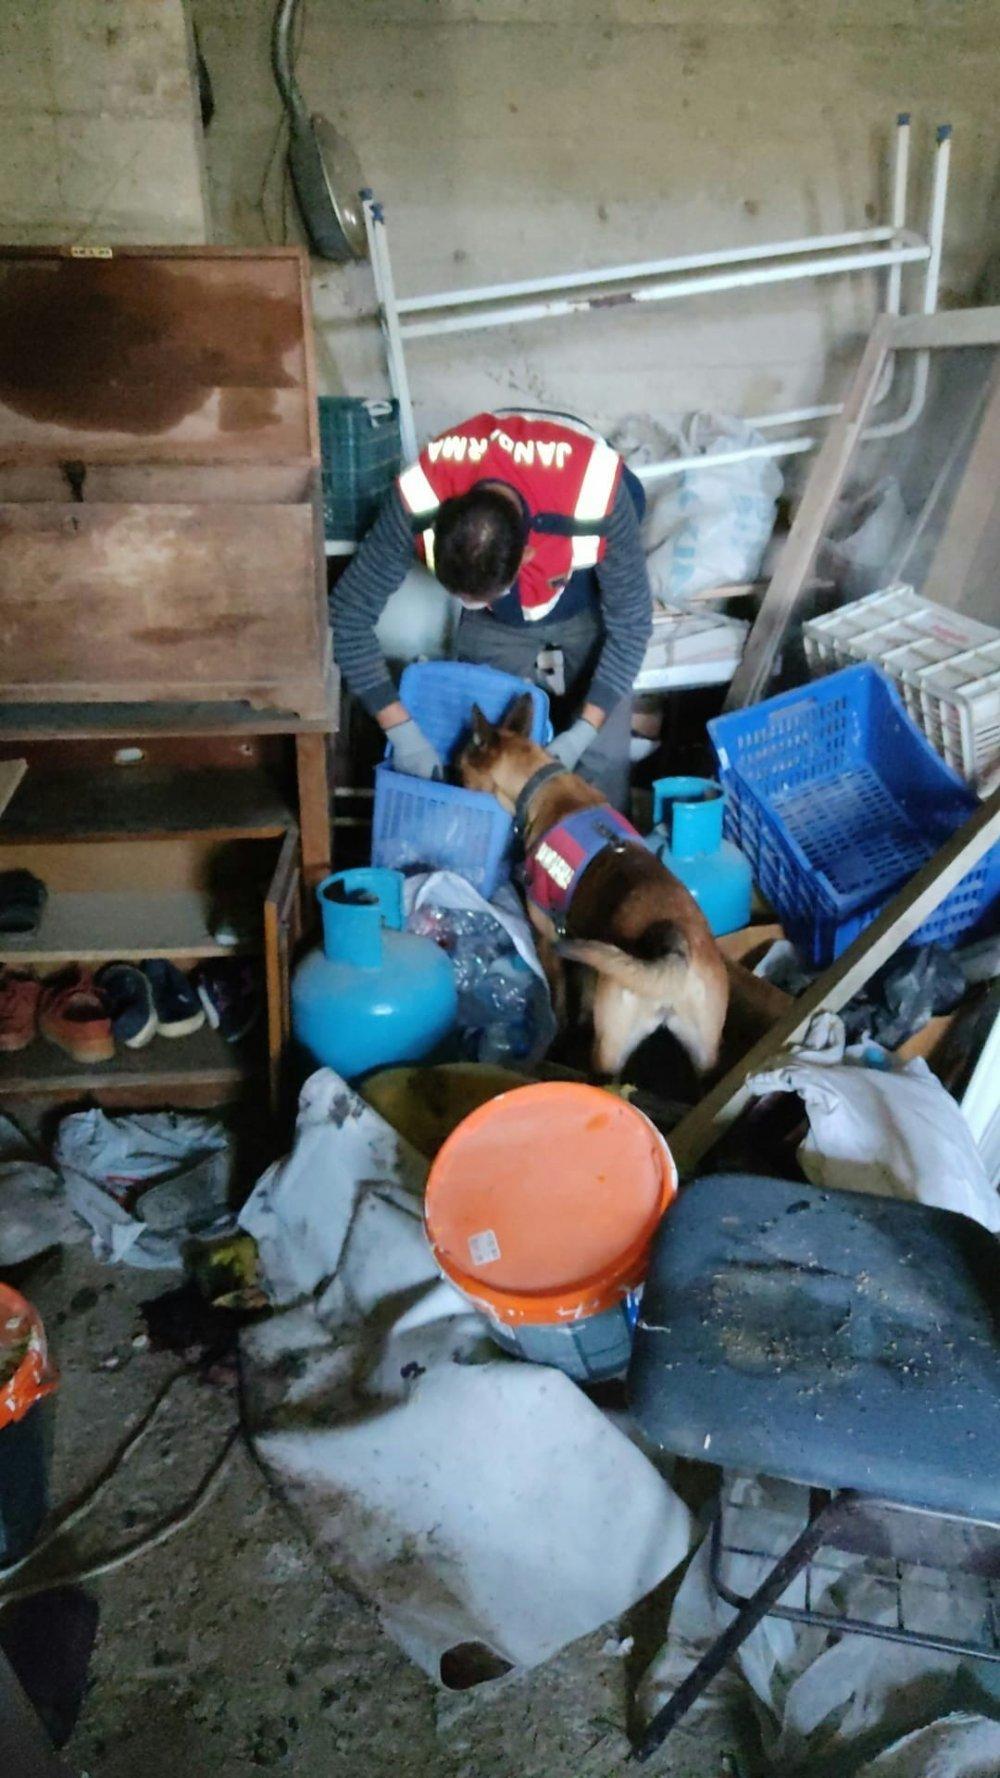 Trabzon'da Jandarmadan uyuşturucu operasyonu